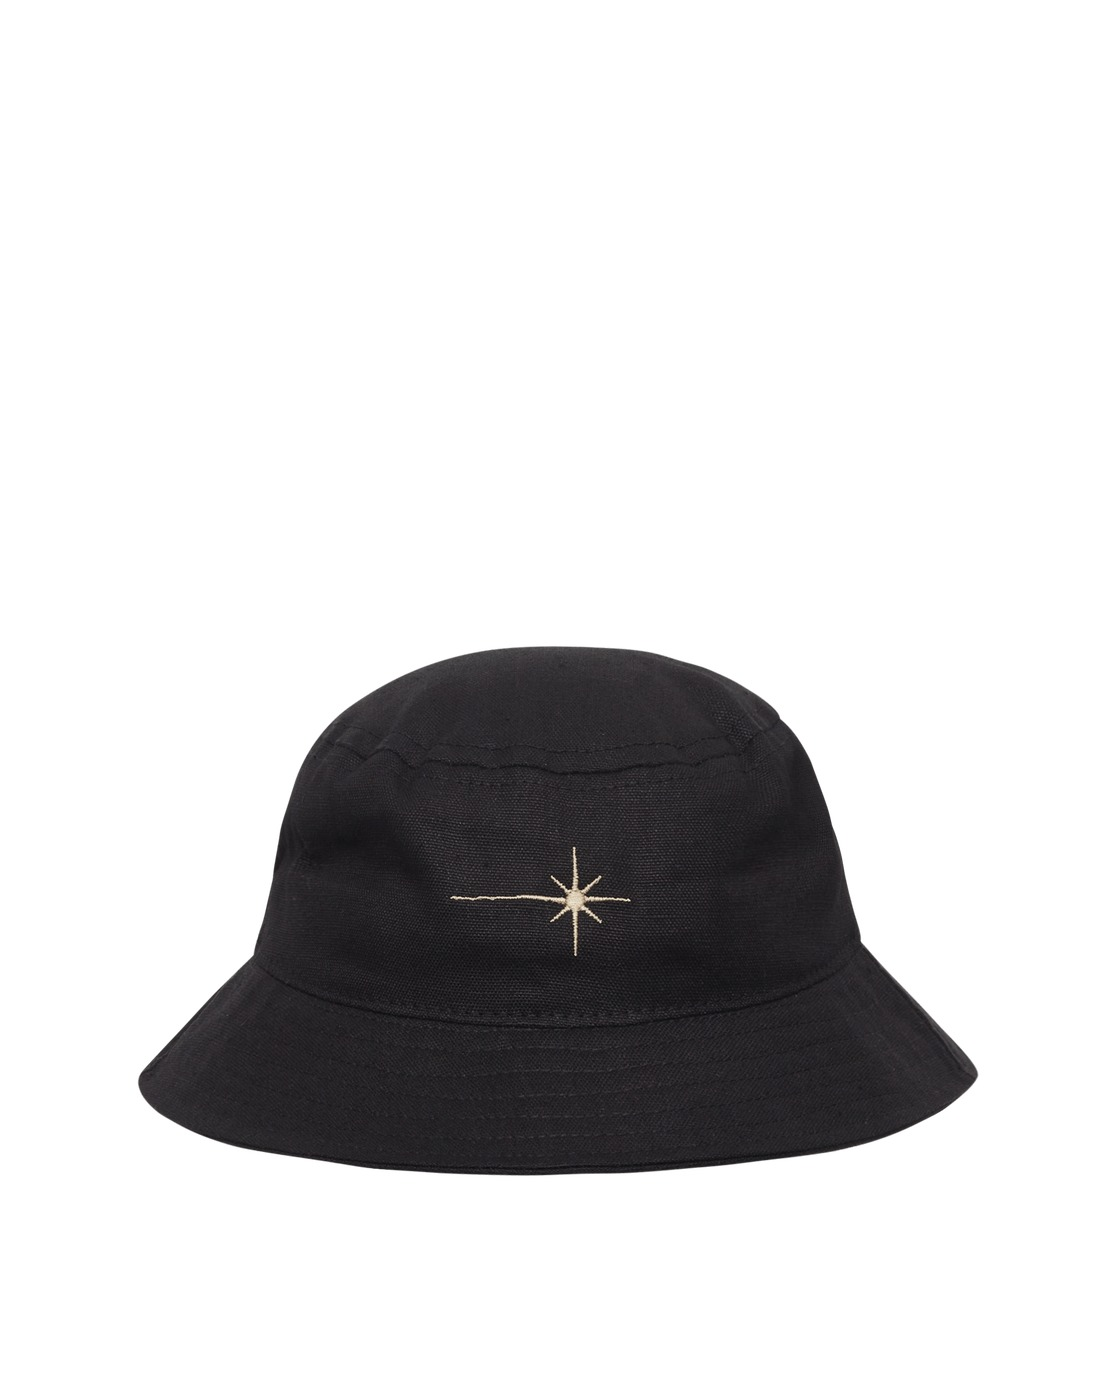 Eden Power Corp Shining Star Bucket Hat Black